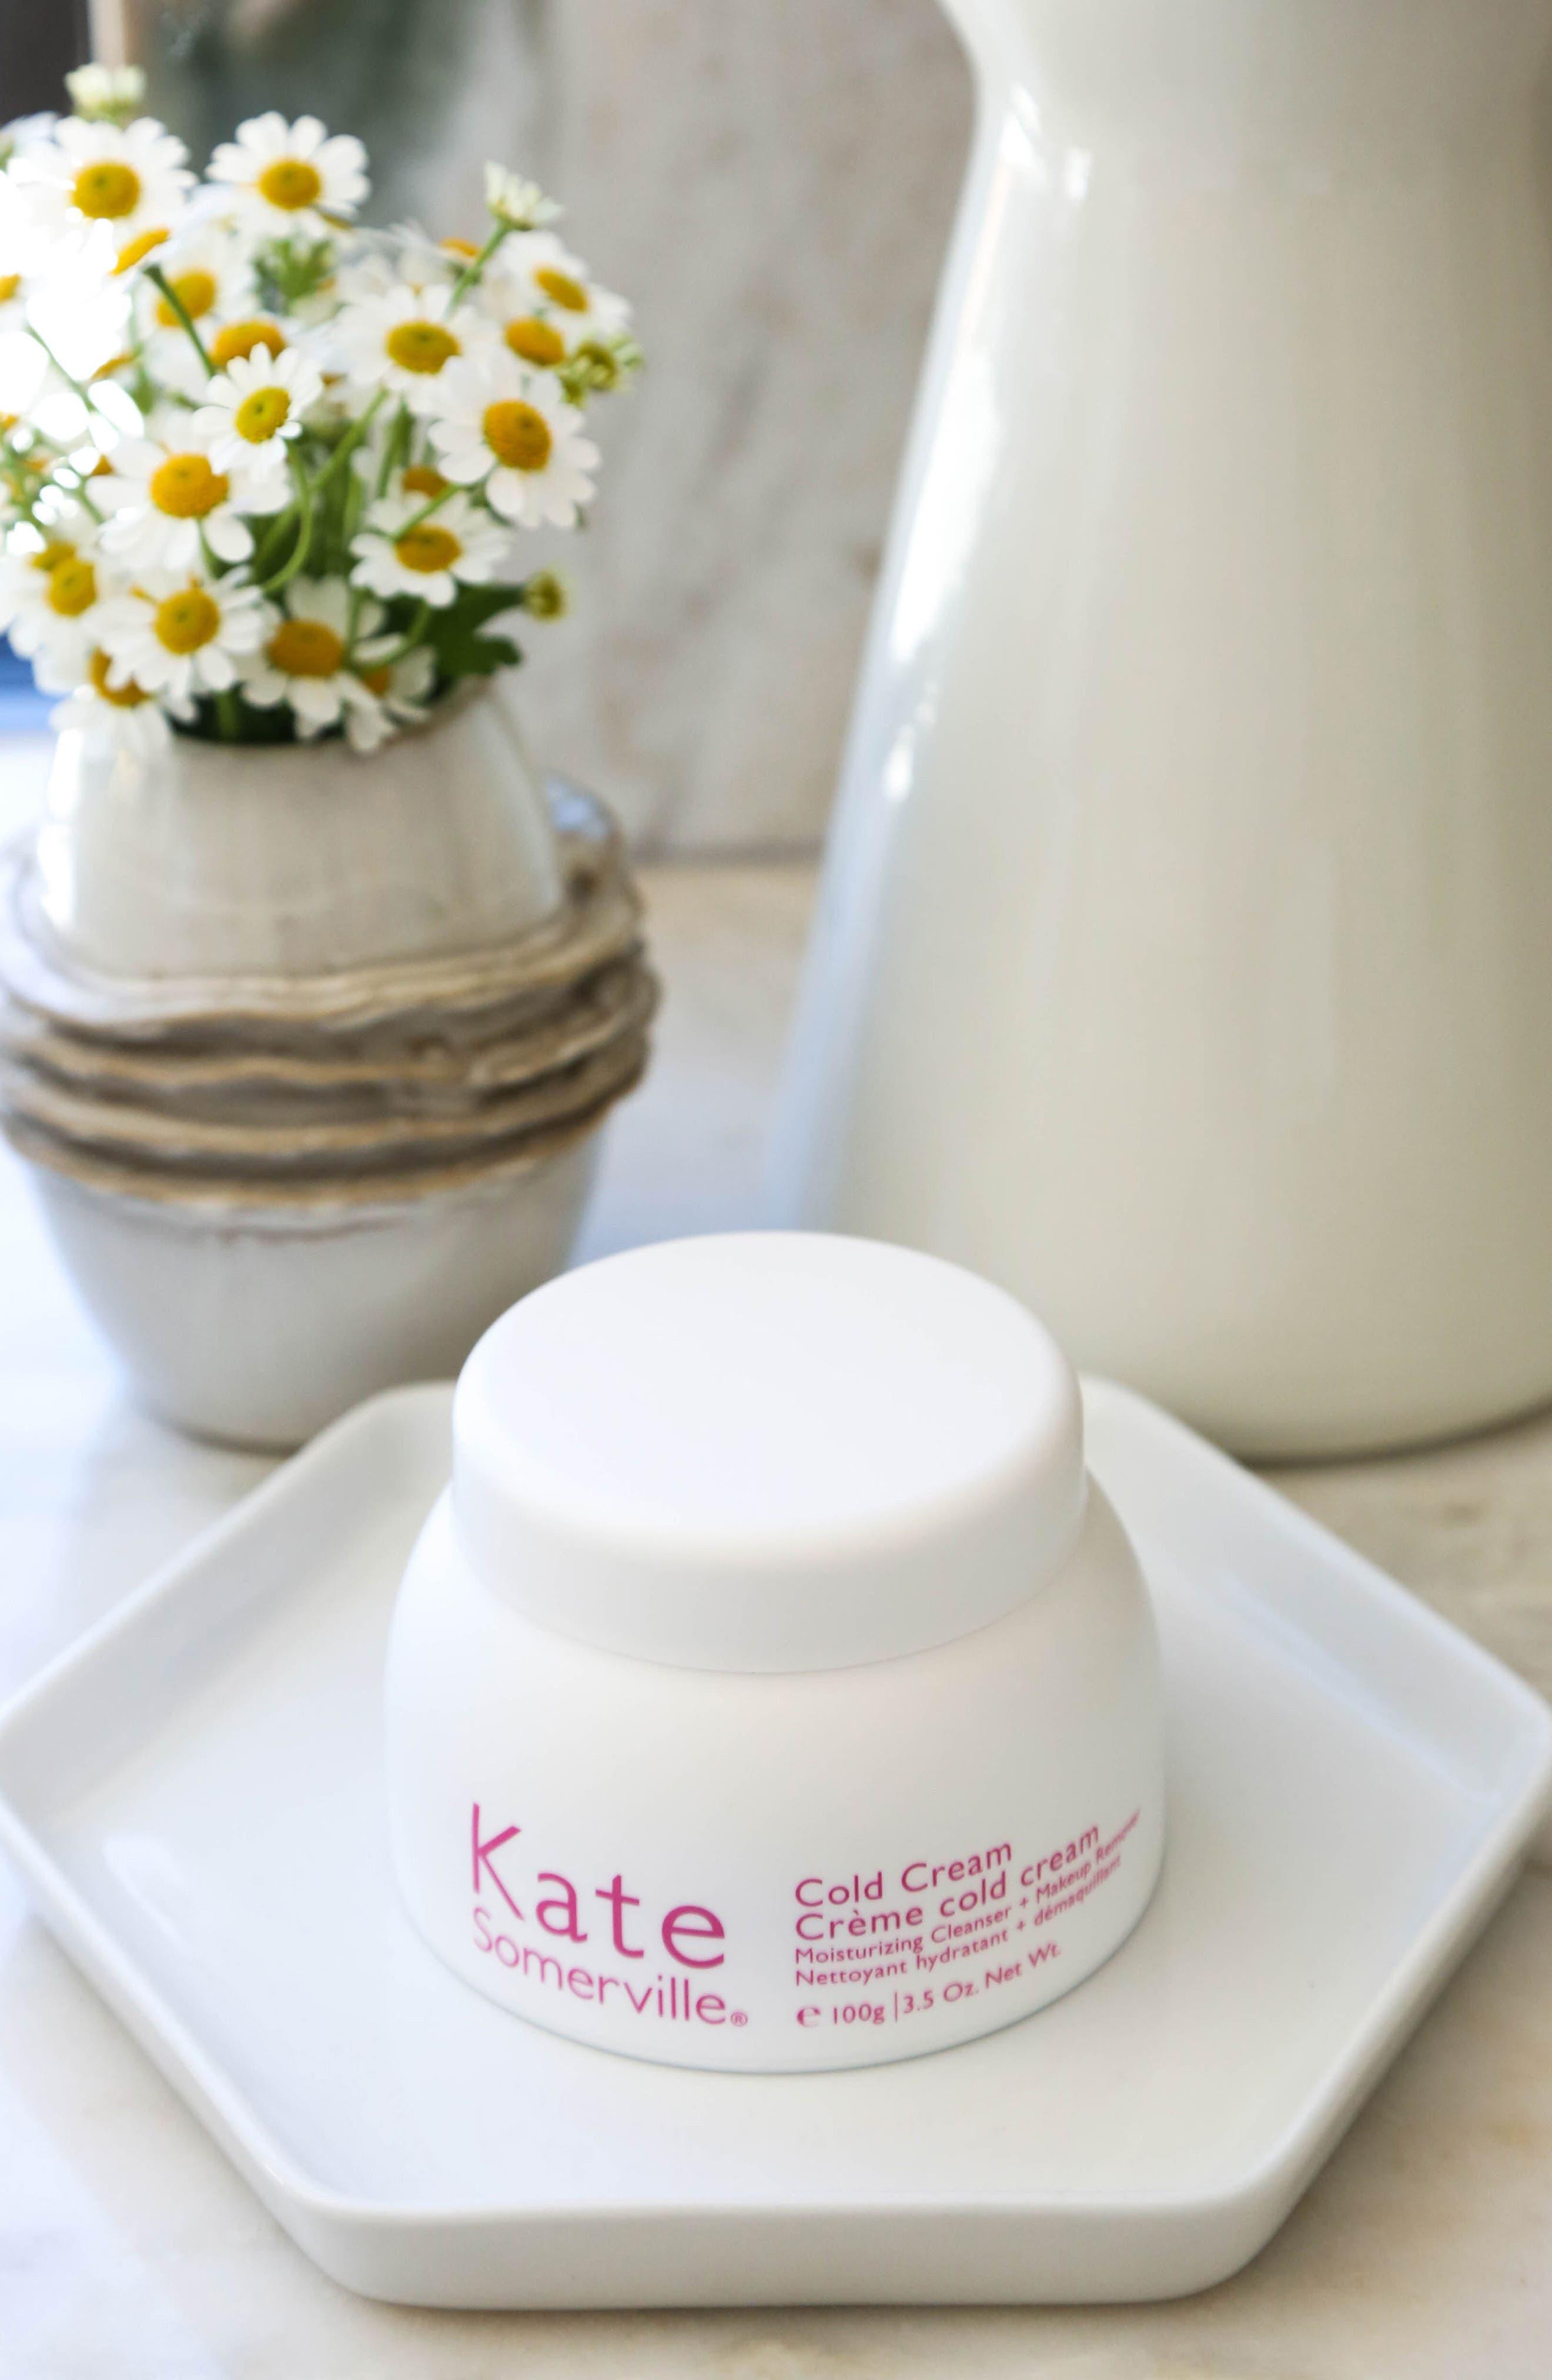 Cold Cream Moisturizing Cleanser + Makeup Remover,                             Alternate thumbnail 6, color,                             NO COLOR